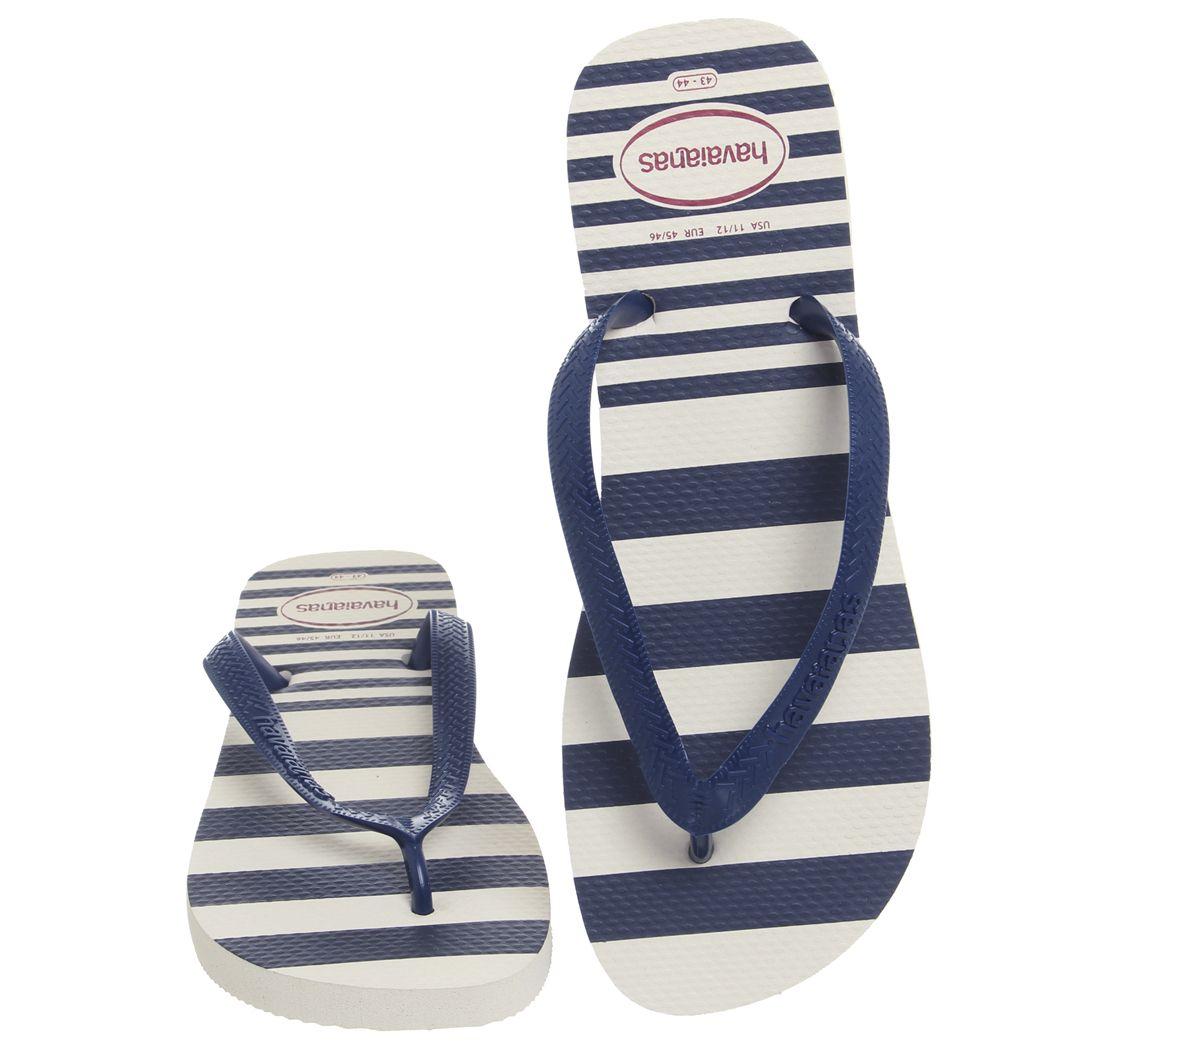 efc4ea832 Havaianas Top Retro Flip Flops Stripe - Sandals